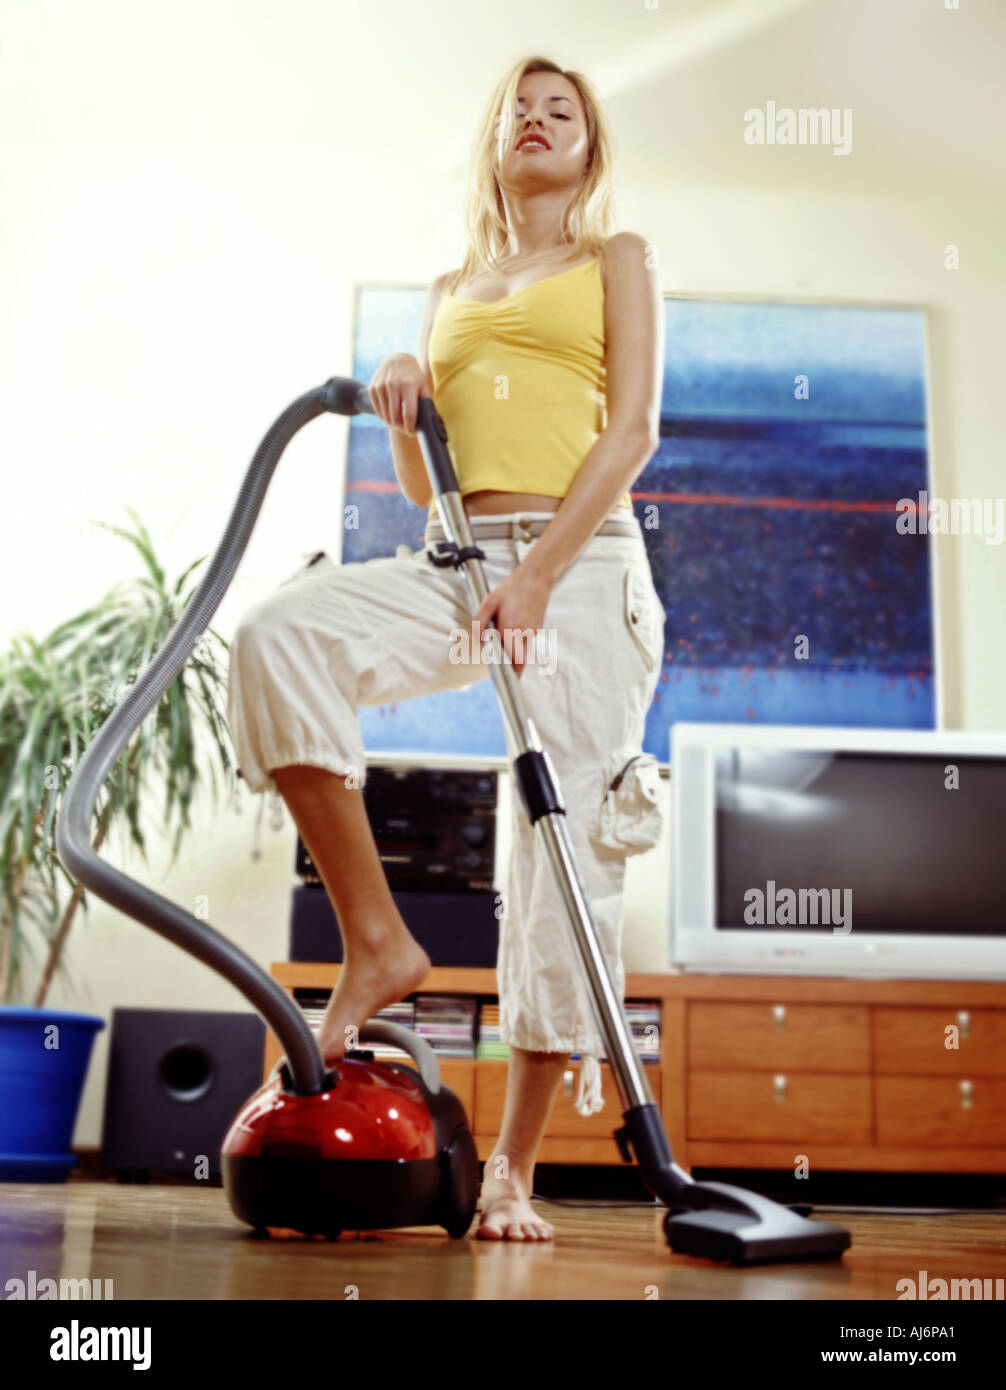 Vertical Girl Woman 20 25 Maid Housewife Tidy Vacuum